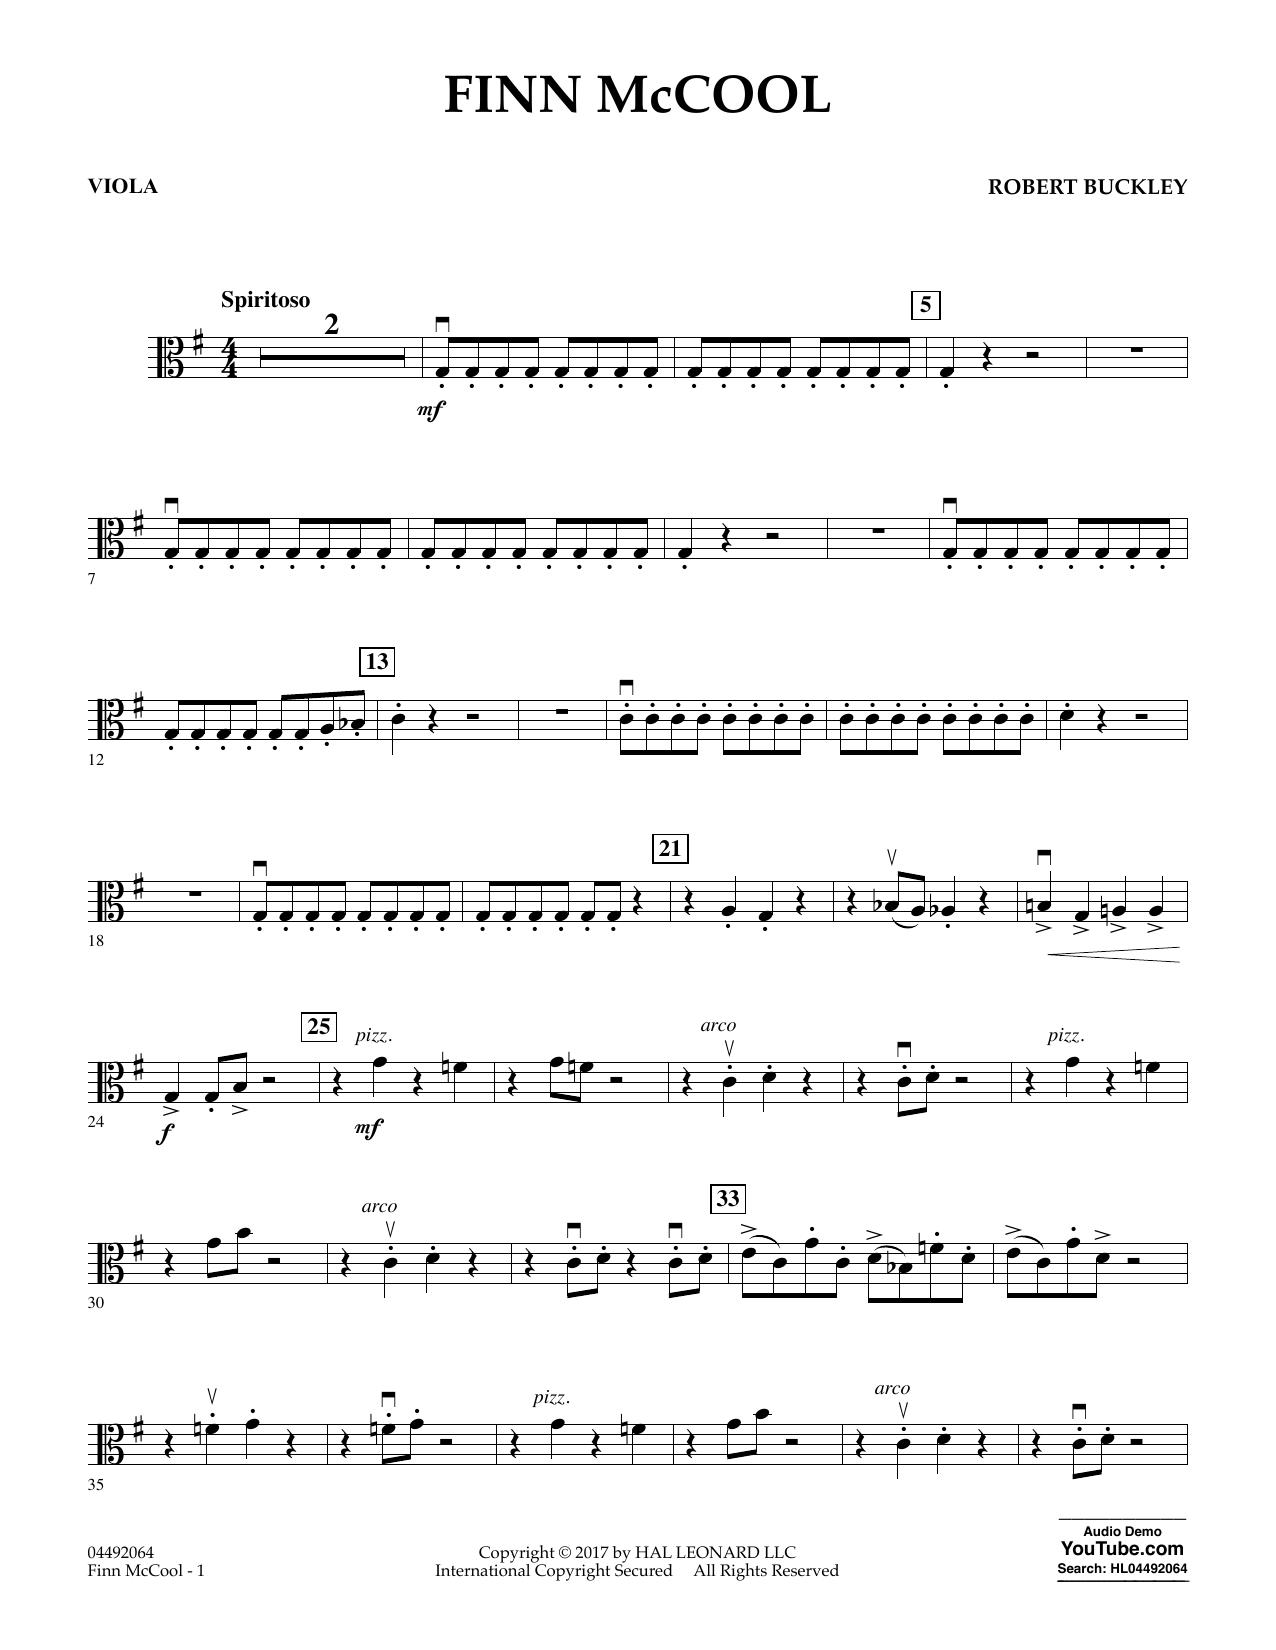 Robert Buckley Finn McCool - Viola sheet music notes and chords. Download Printable PDF.